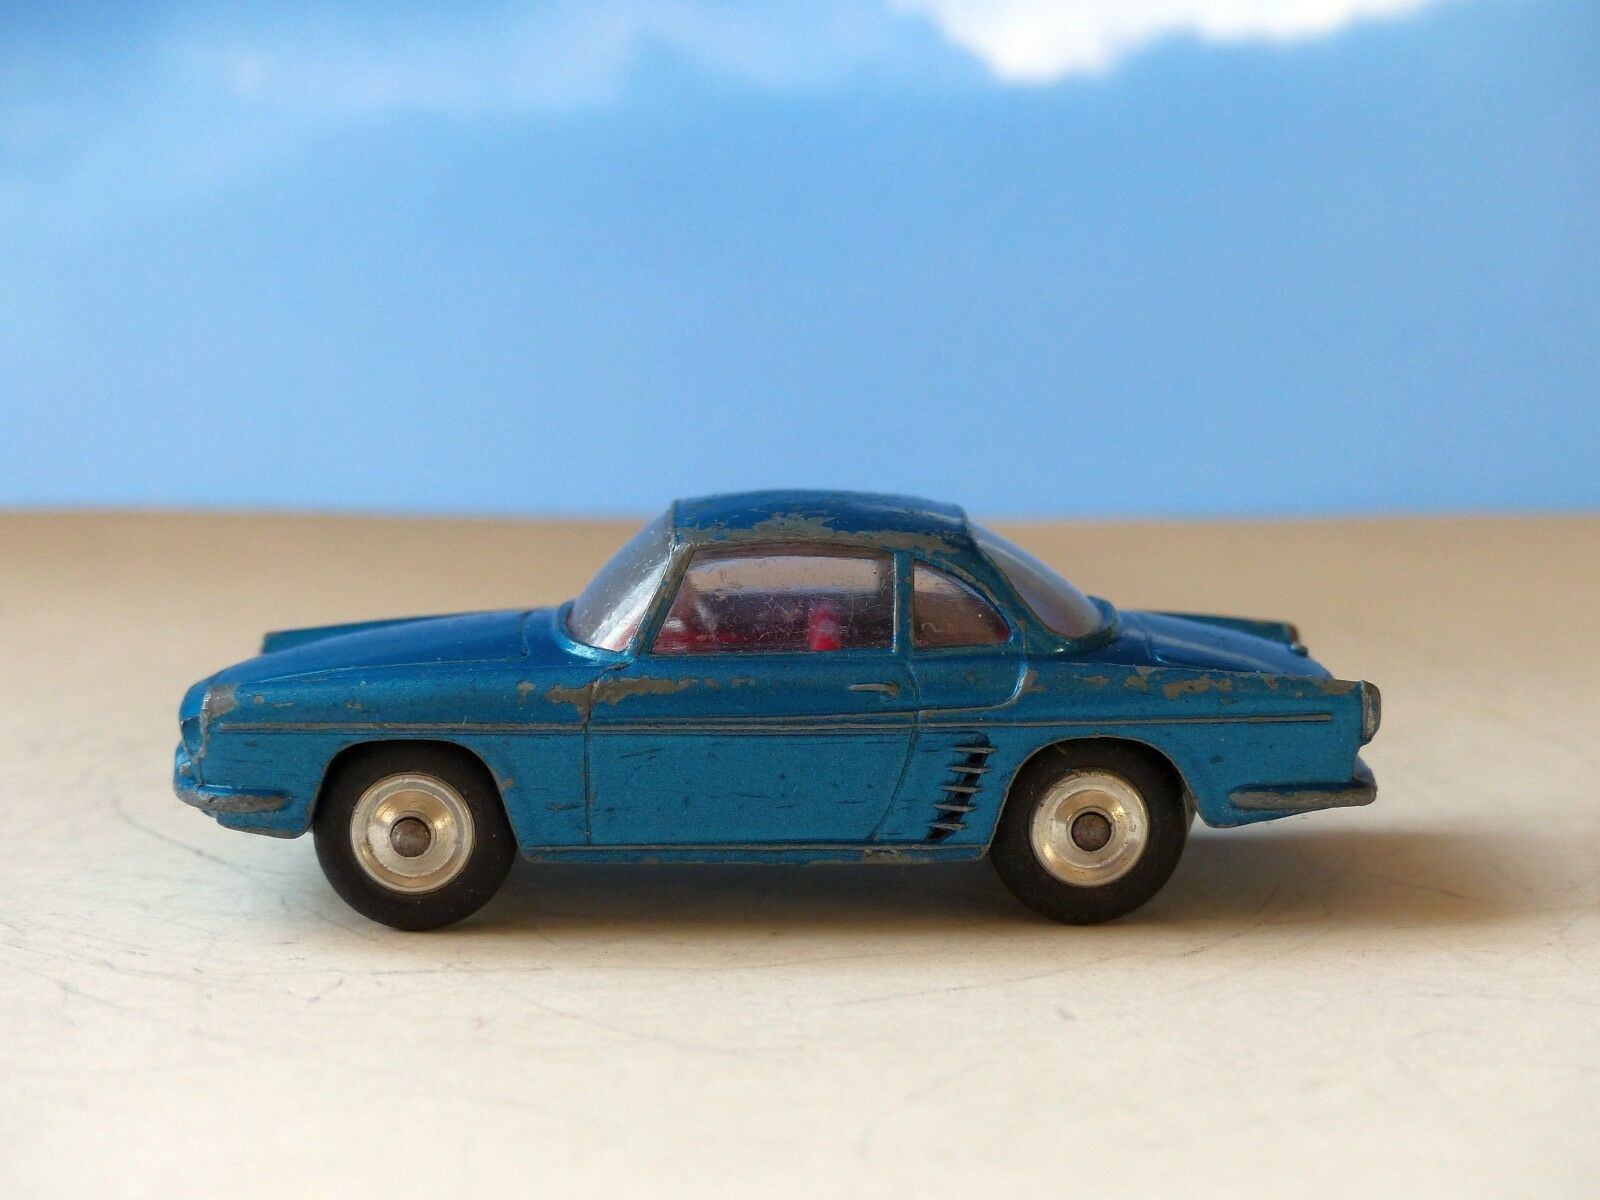 Corgi Toys 222 Renault Floride in Blau with rot interior